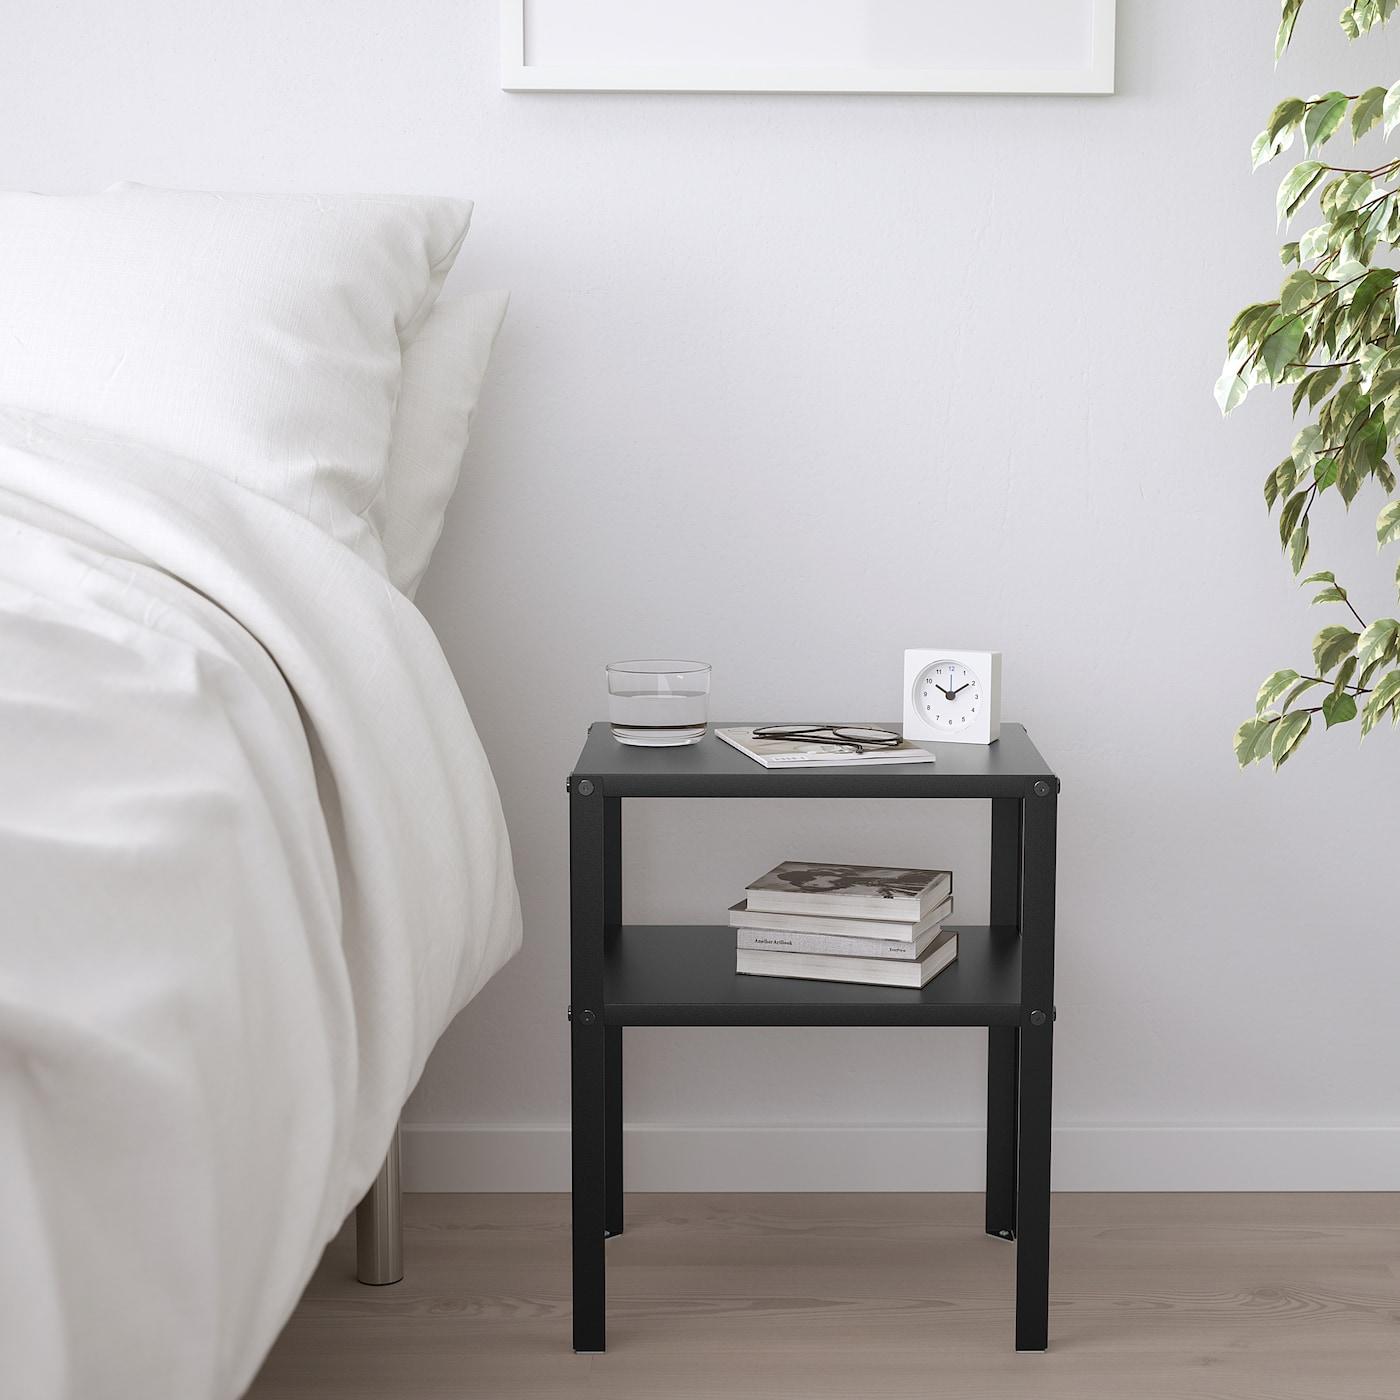 Knarrevik Nightstand Black 14 5 8x11 Ikea